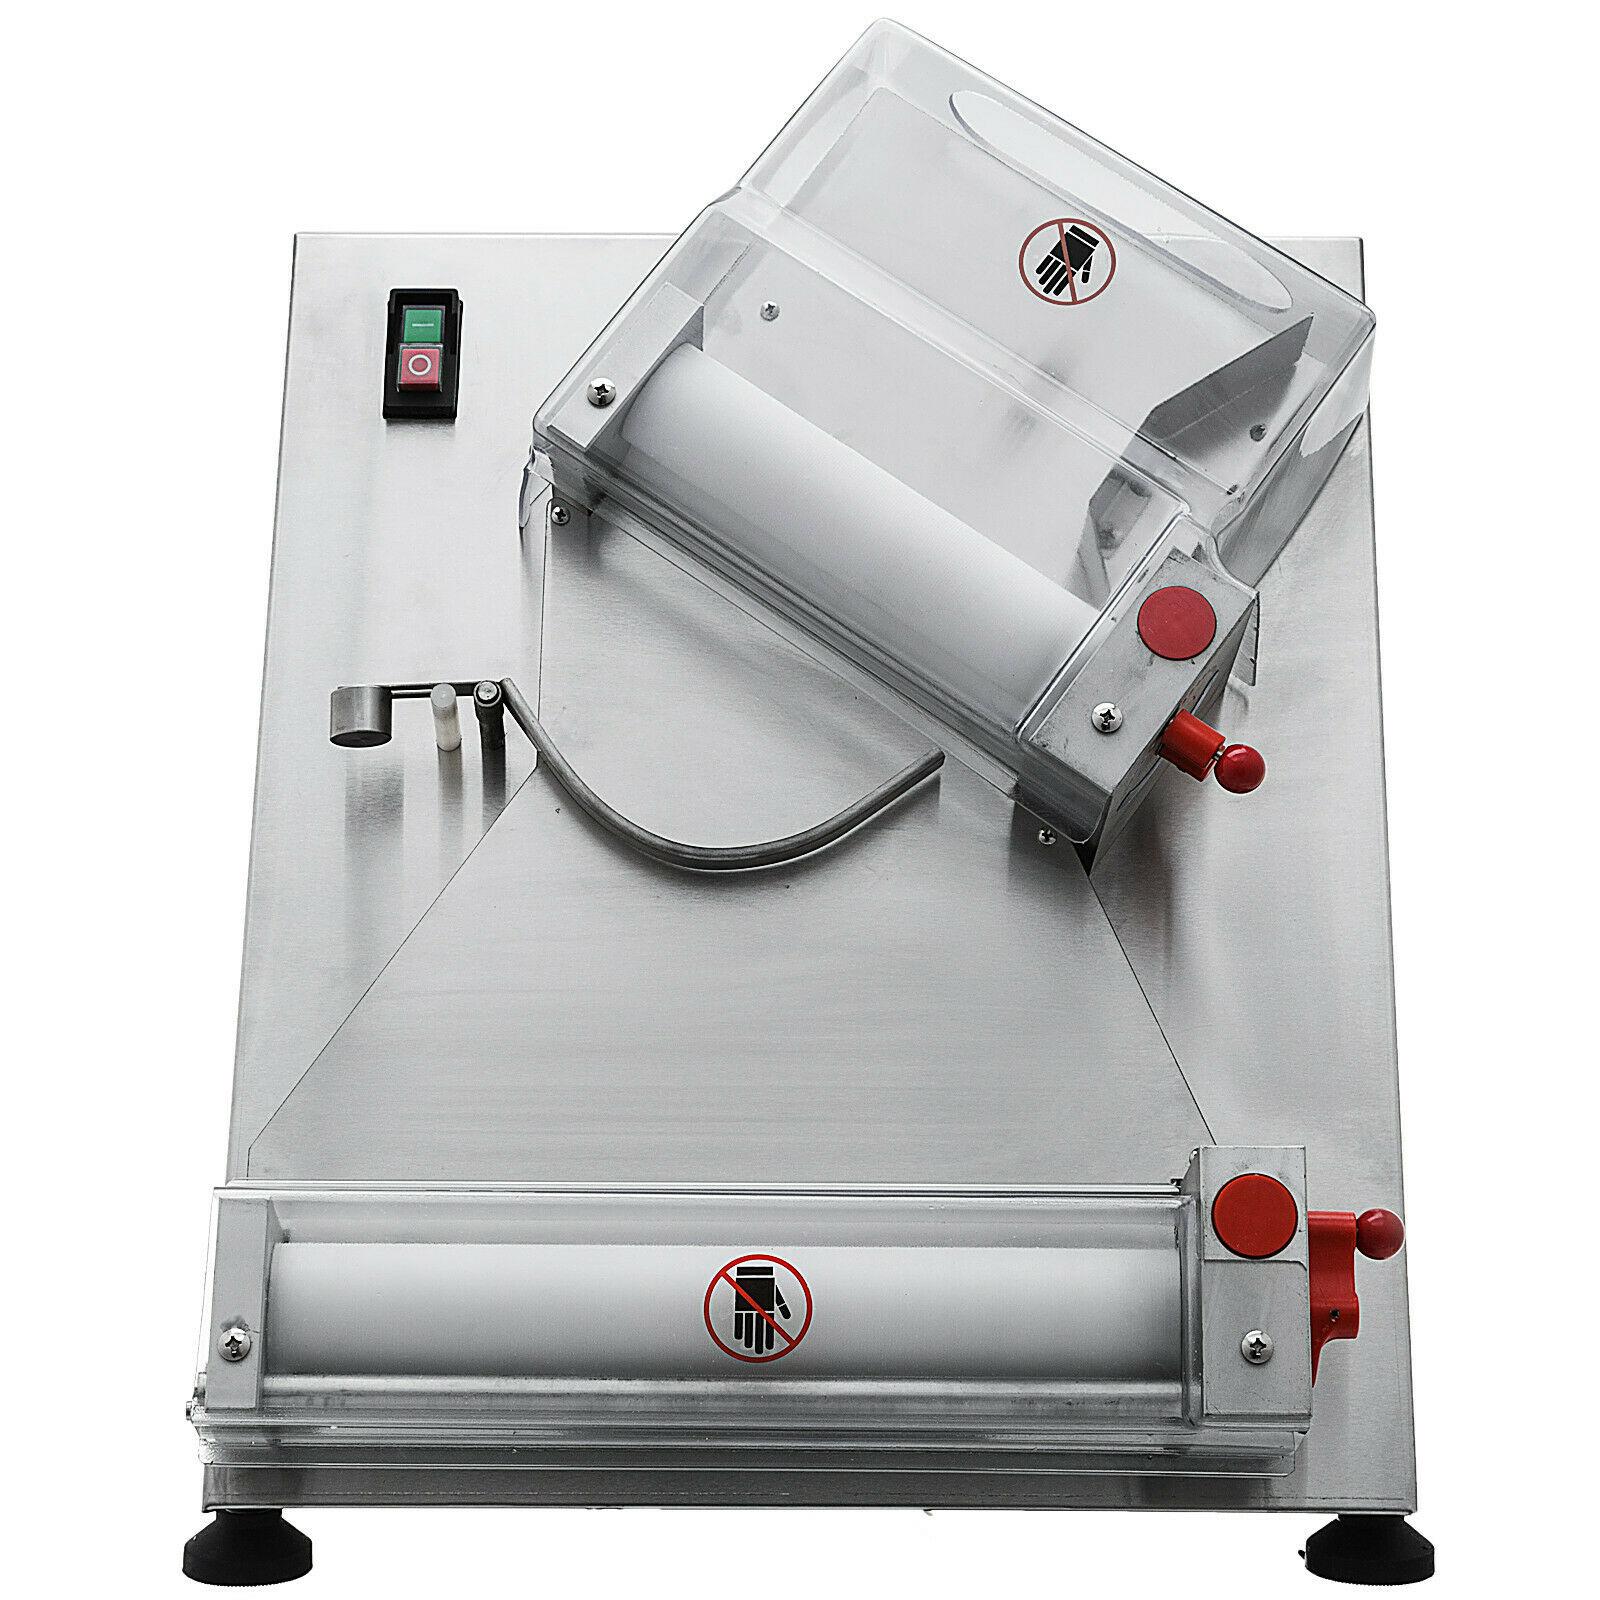 Laminadora de masa eléctrica de acero inoxidable con rodillo de masa de Pizza 110V